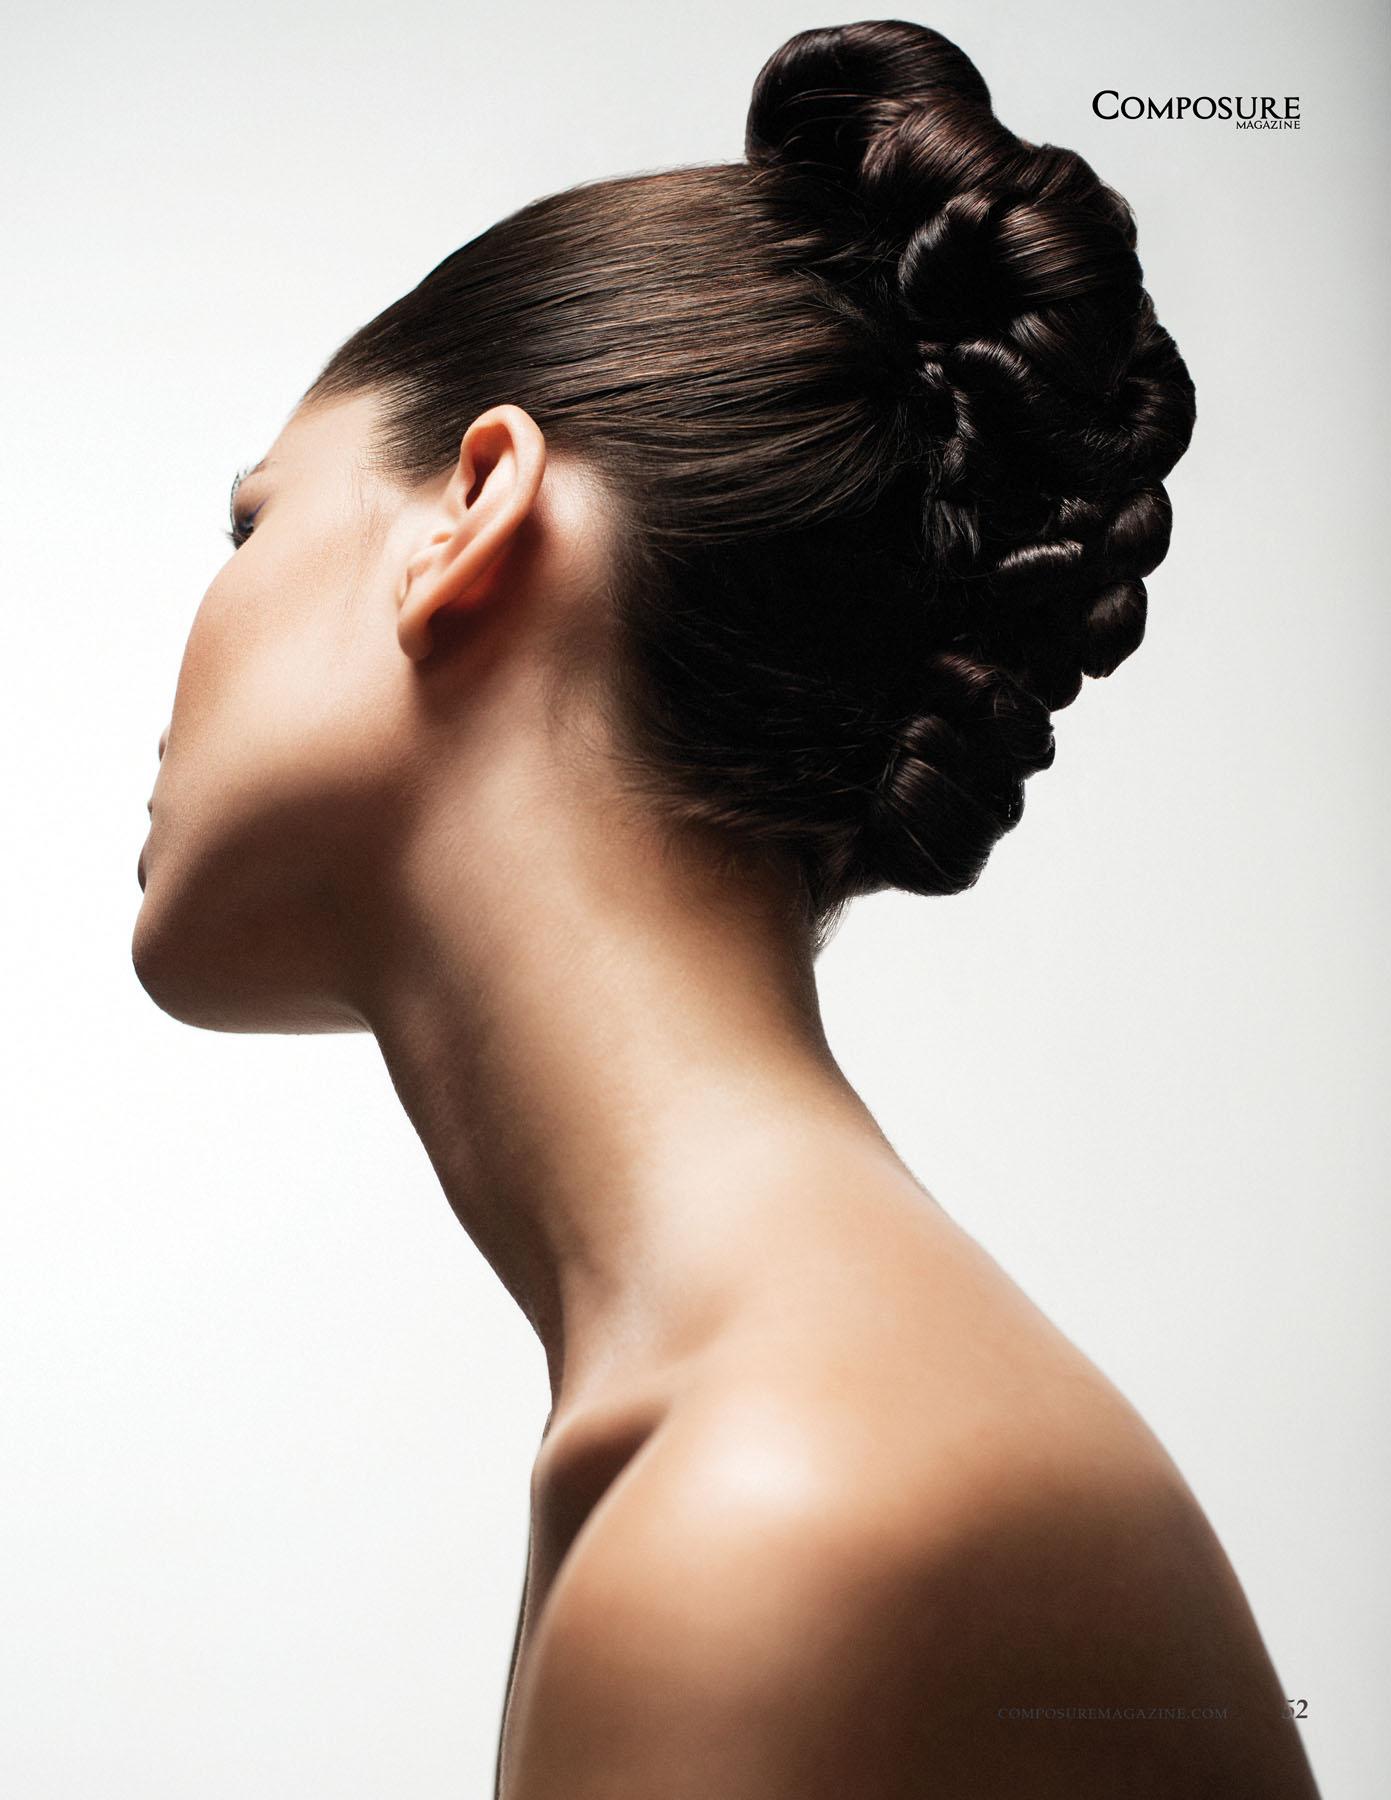 Beauty editorial photographed by john Hong